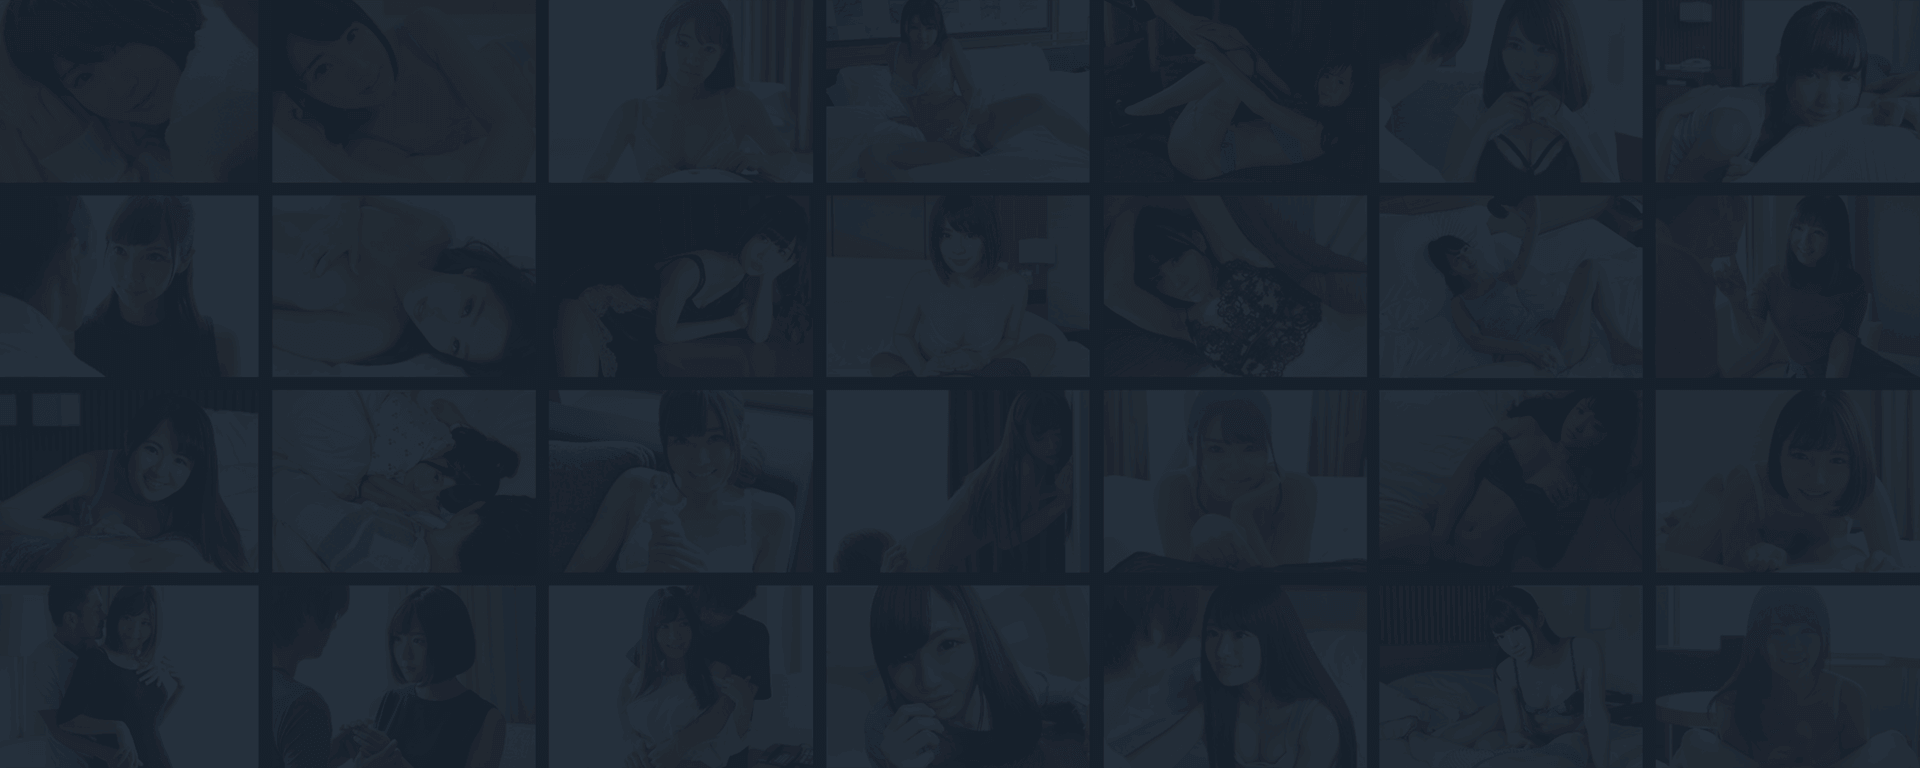 Yoko宅夏:被那双迷人的双眼吸引着[98P/796M]